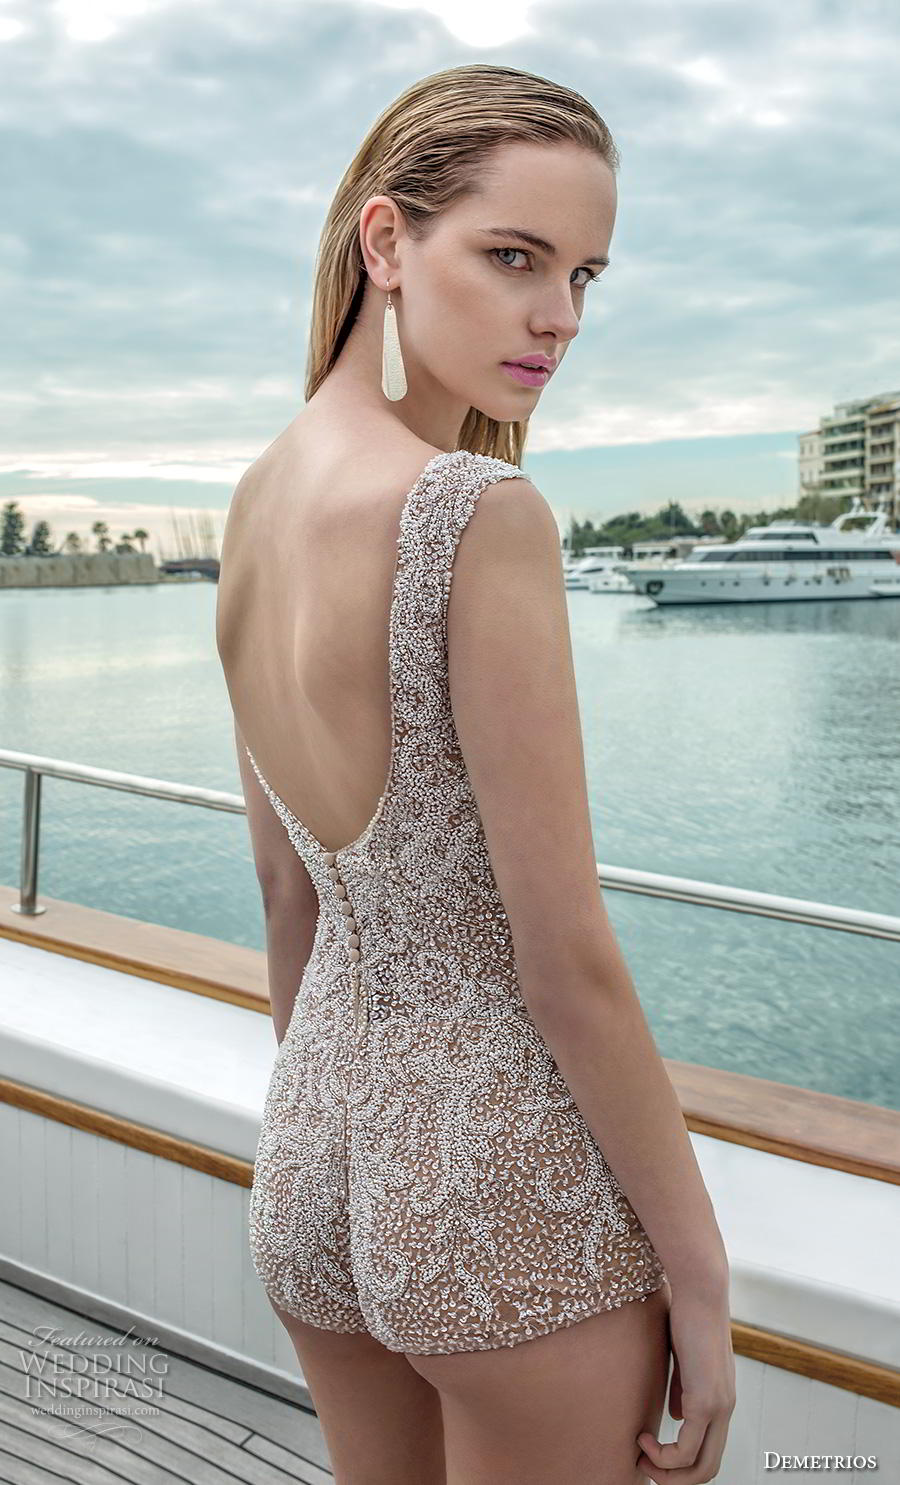 6233cd73b22a8 Swimsuit Wedding Dress